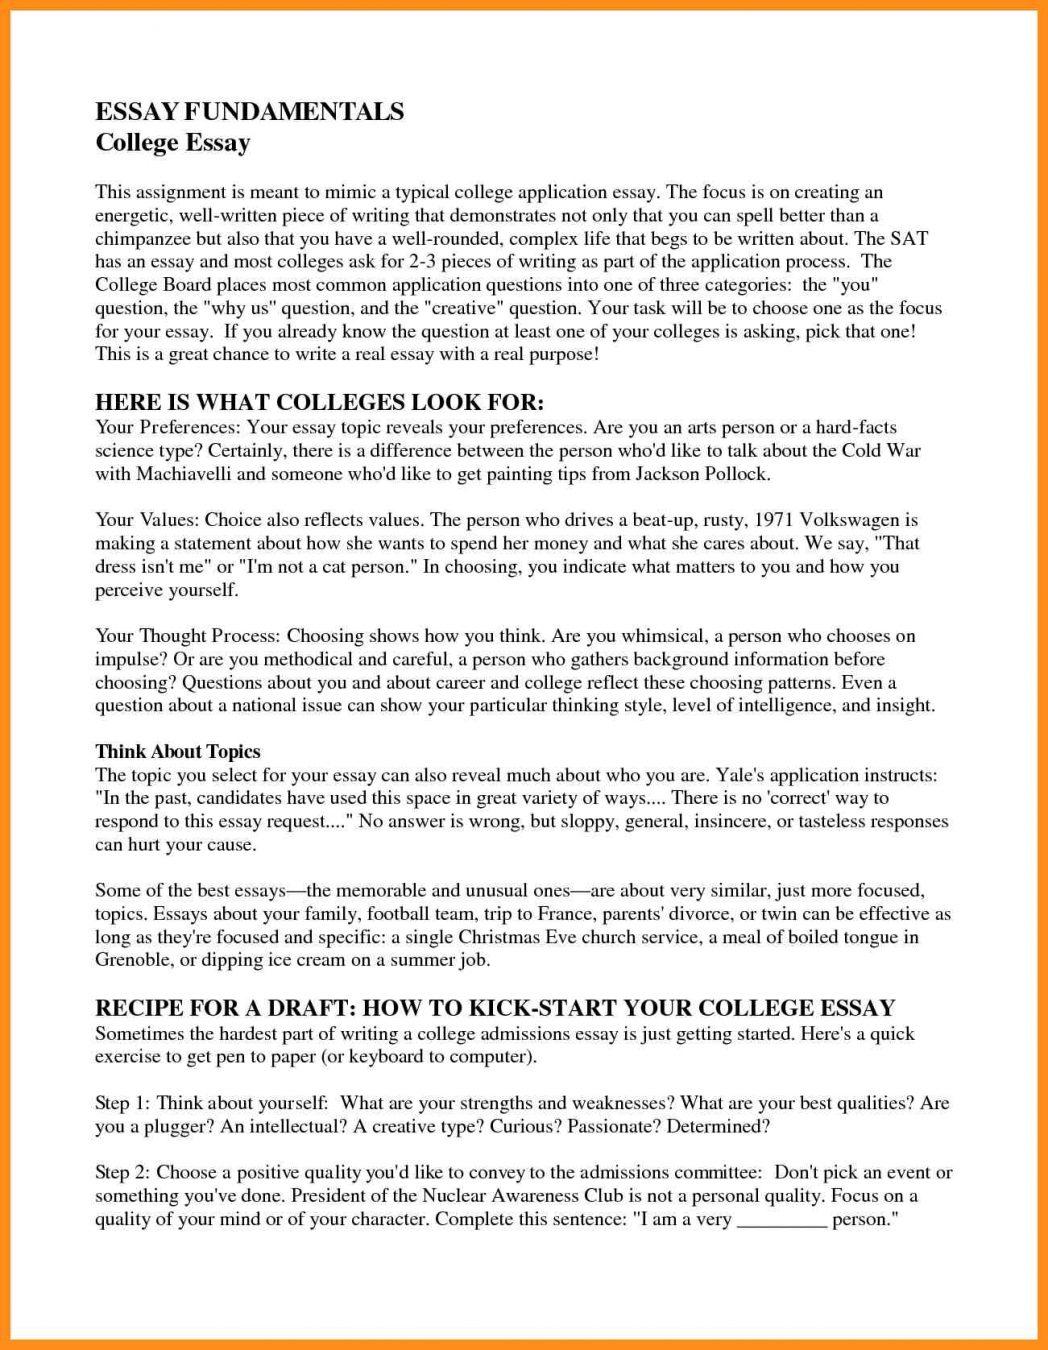 001 Essay Example Write Essays For Money Goal Blockety Co Writing College Newest Depict Jlirxaj Cash Best Uni Scholarship Full